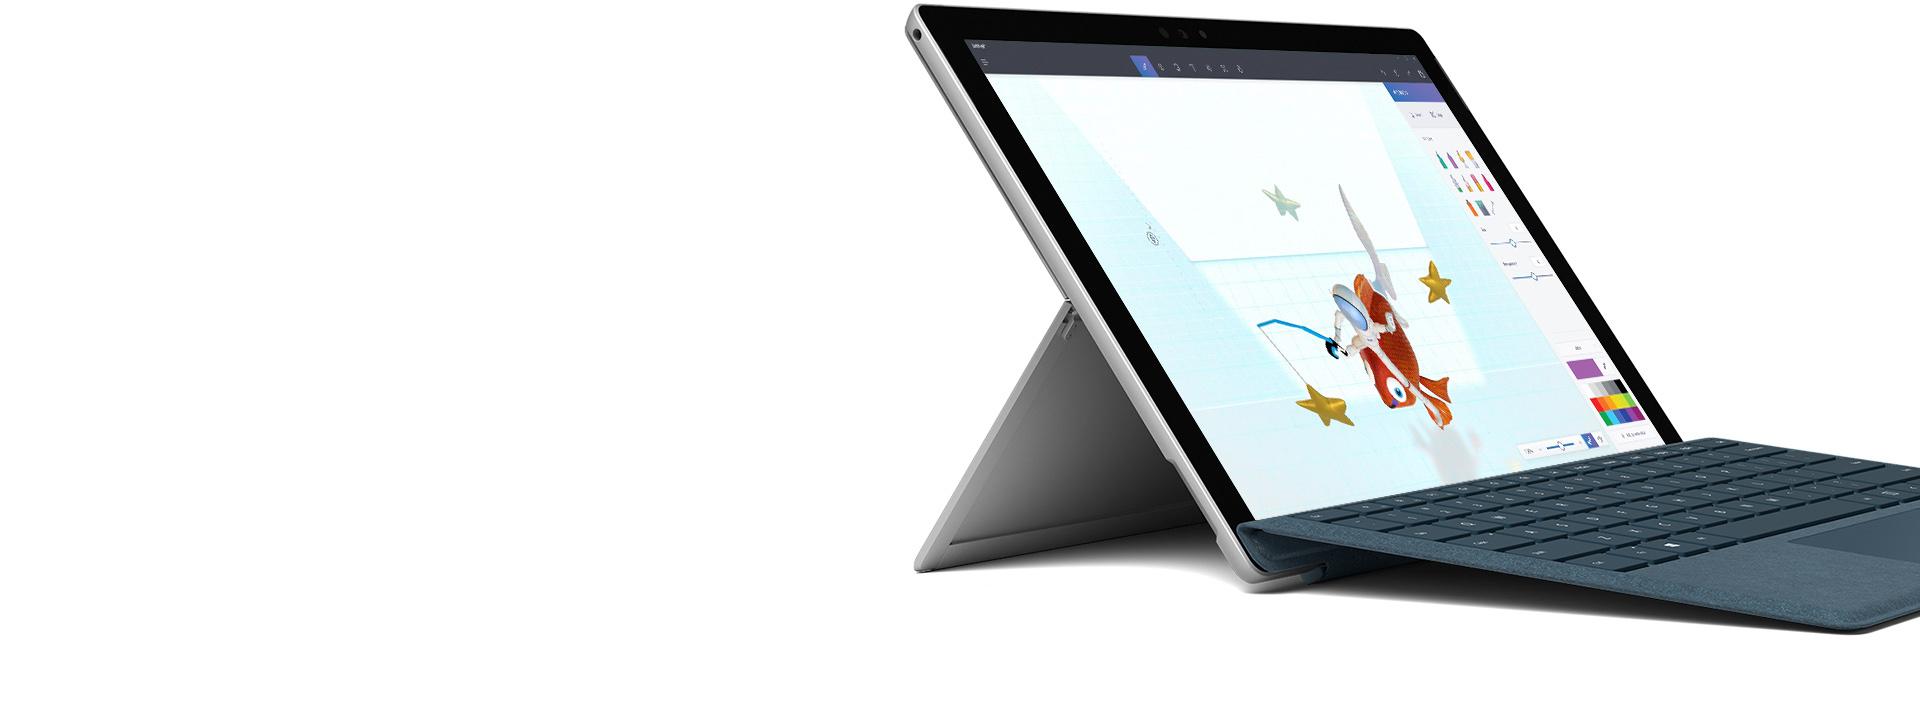 Surface Pro w trybie laptopa, pióro i klawiatura Type Cover.